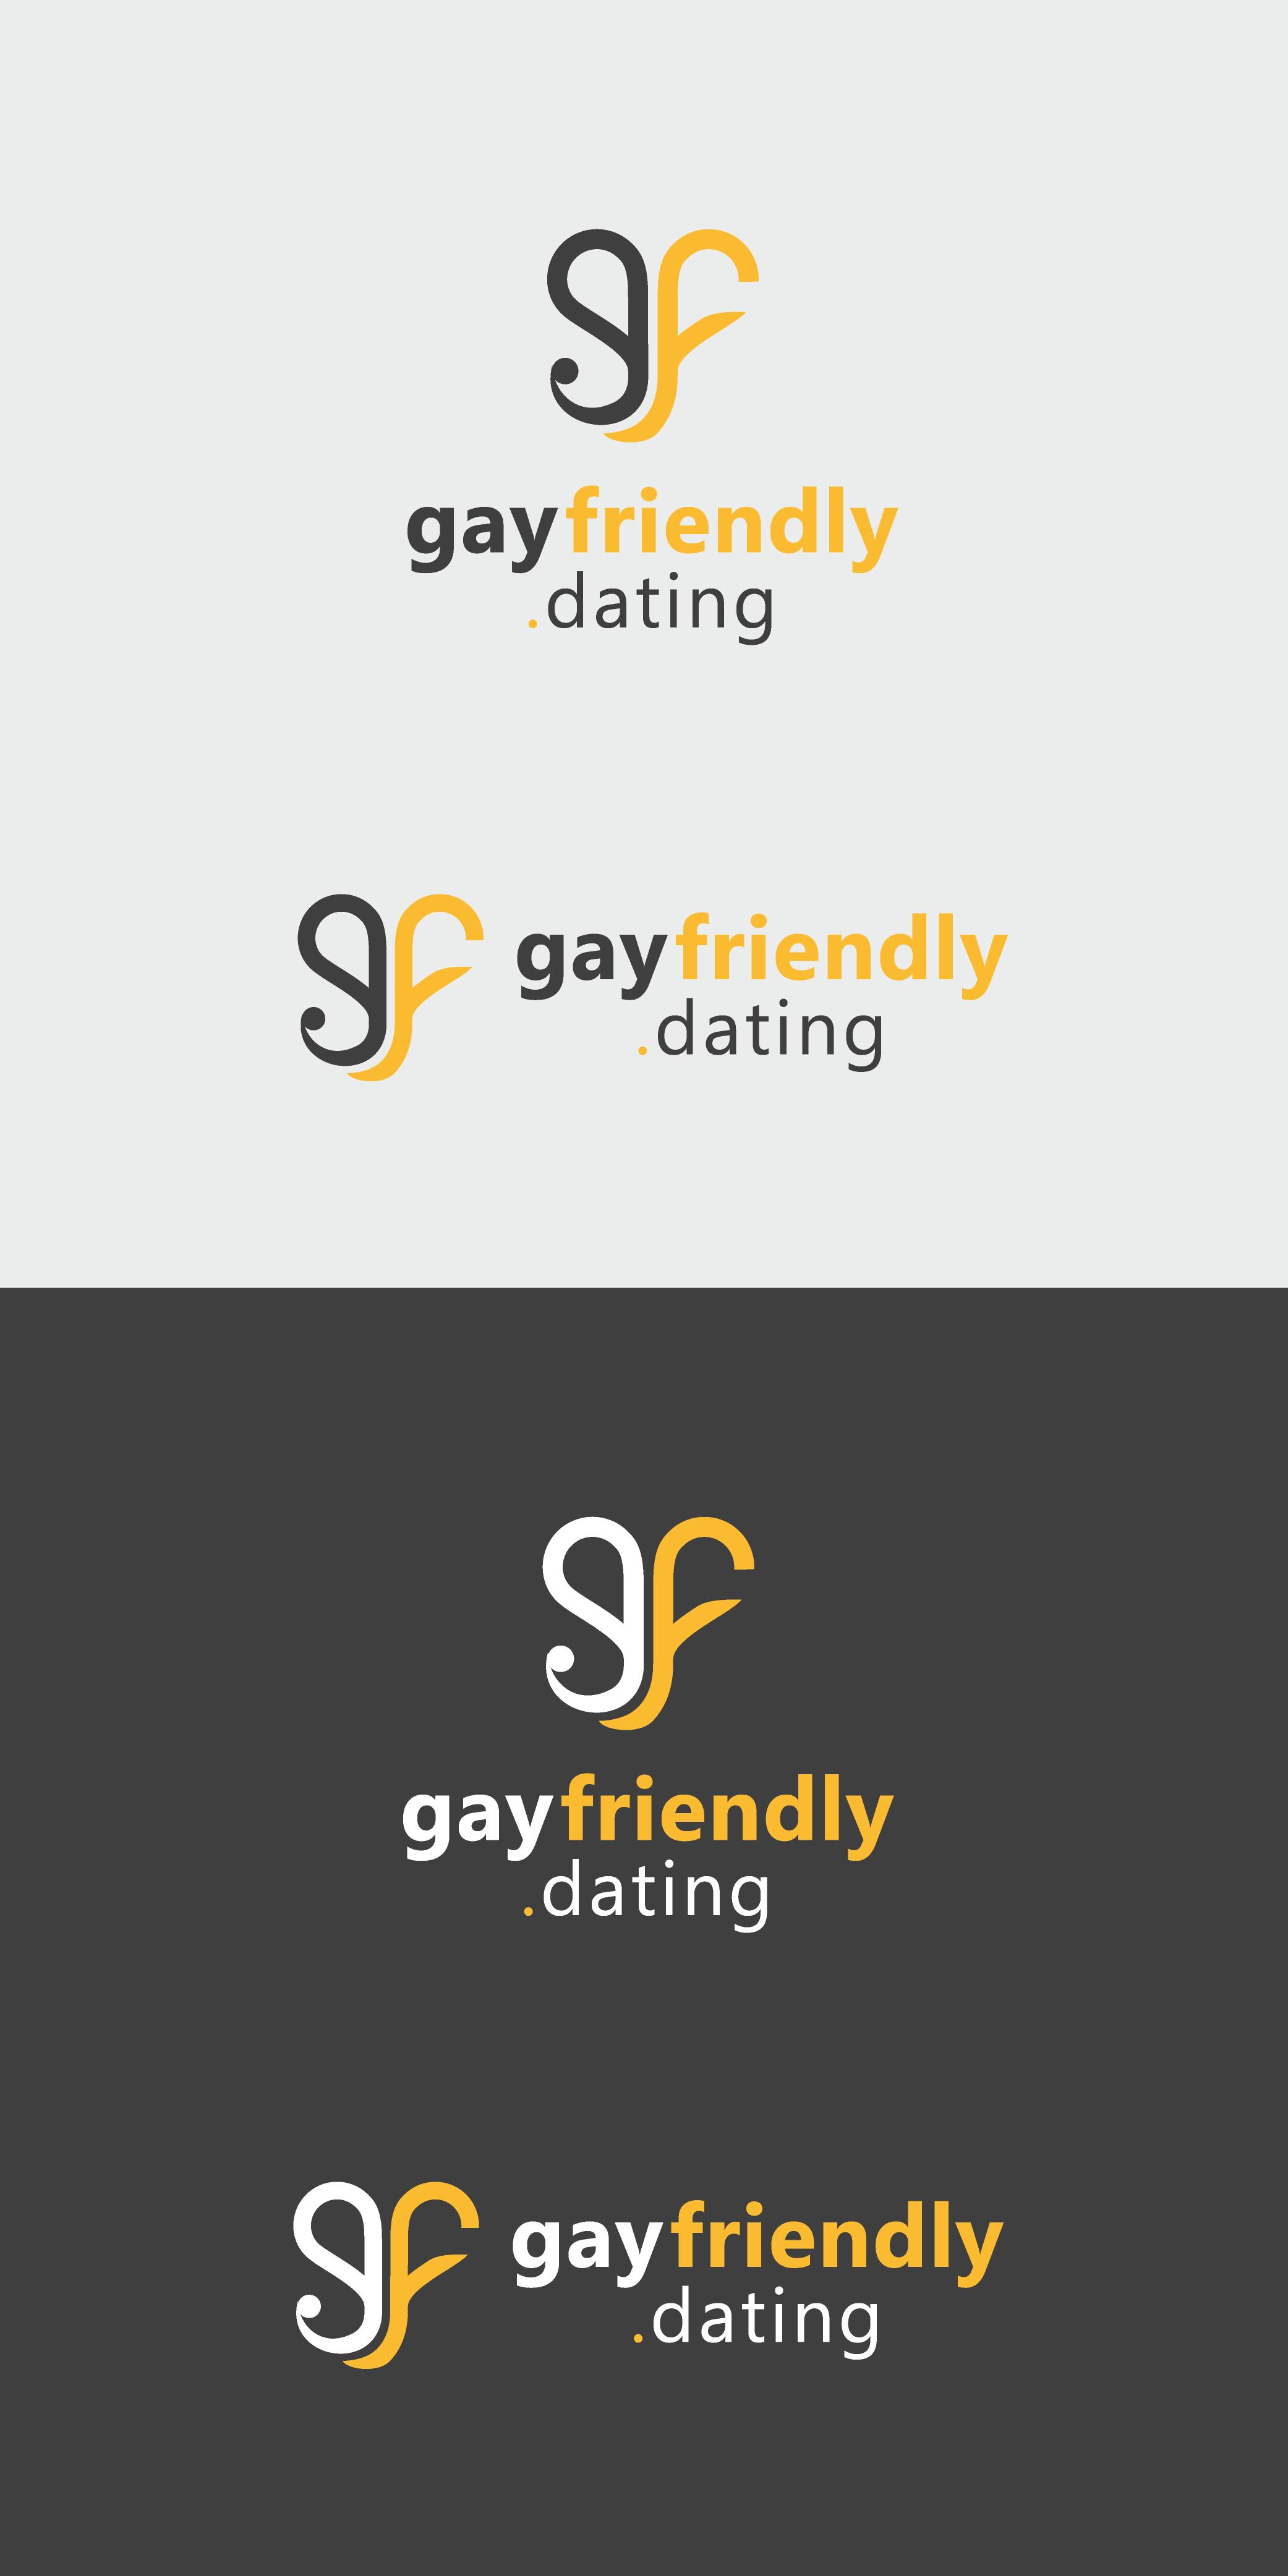 Разработать логотип для англоязычн. сайта знакомств для геев фото f_3945b4475d04ae92.jpg